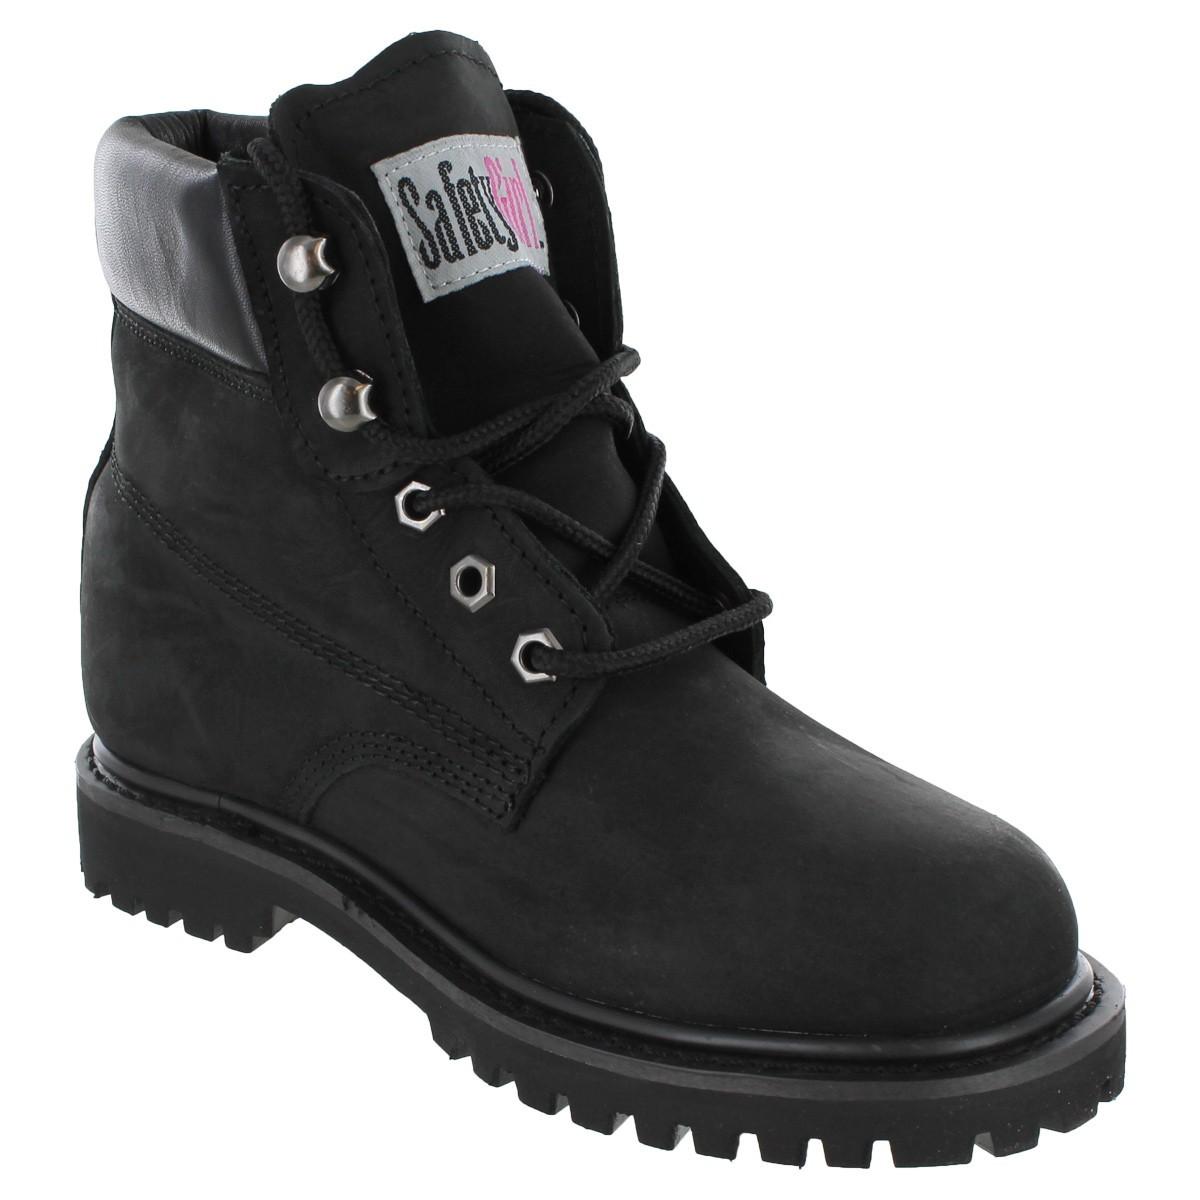 steel toe shoes for women safety girl ii steel toe work boots - black skobver